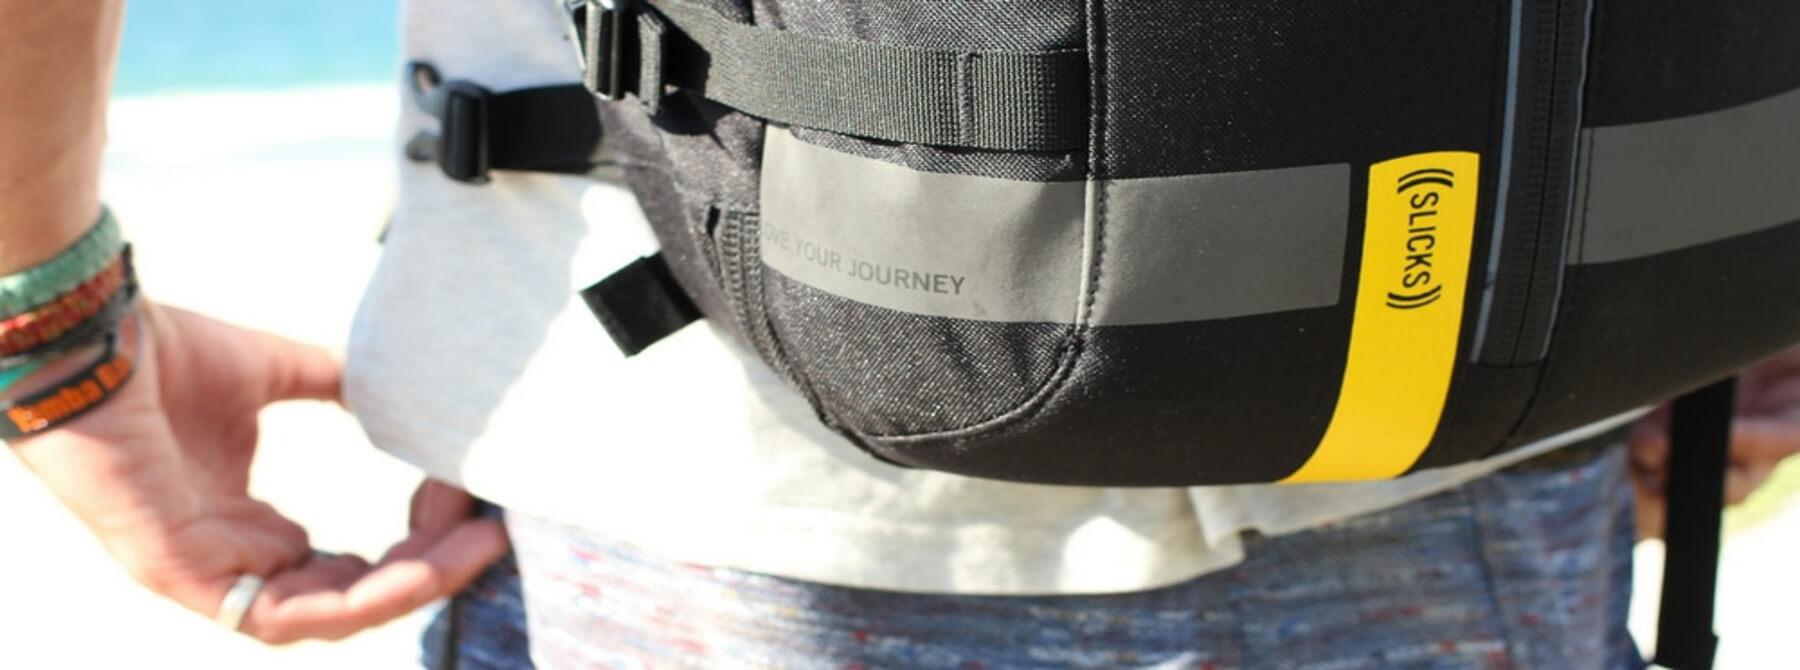 sac pour entrepreneurs nomades